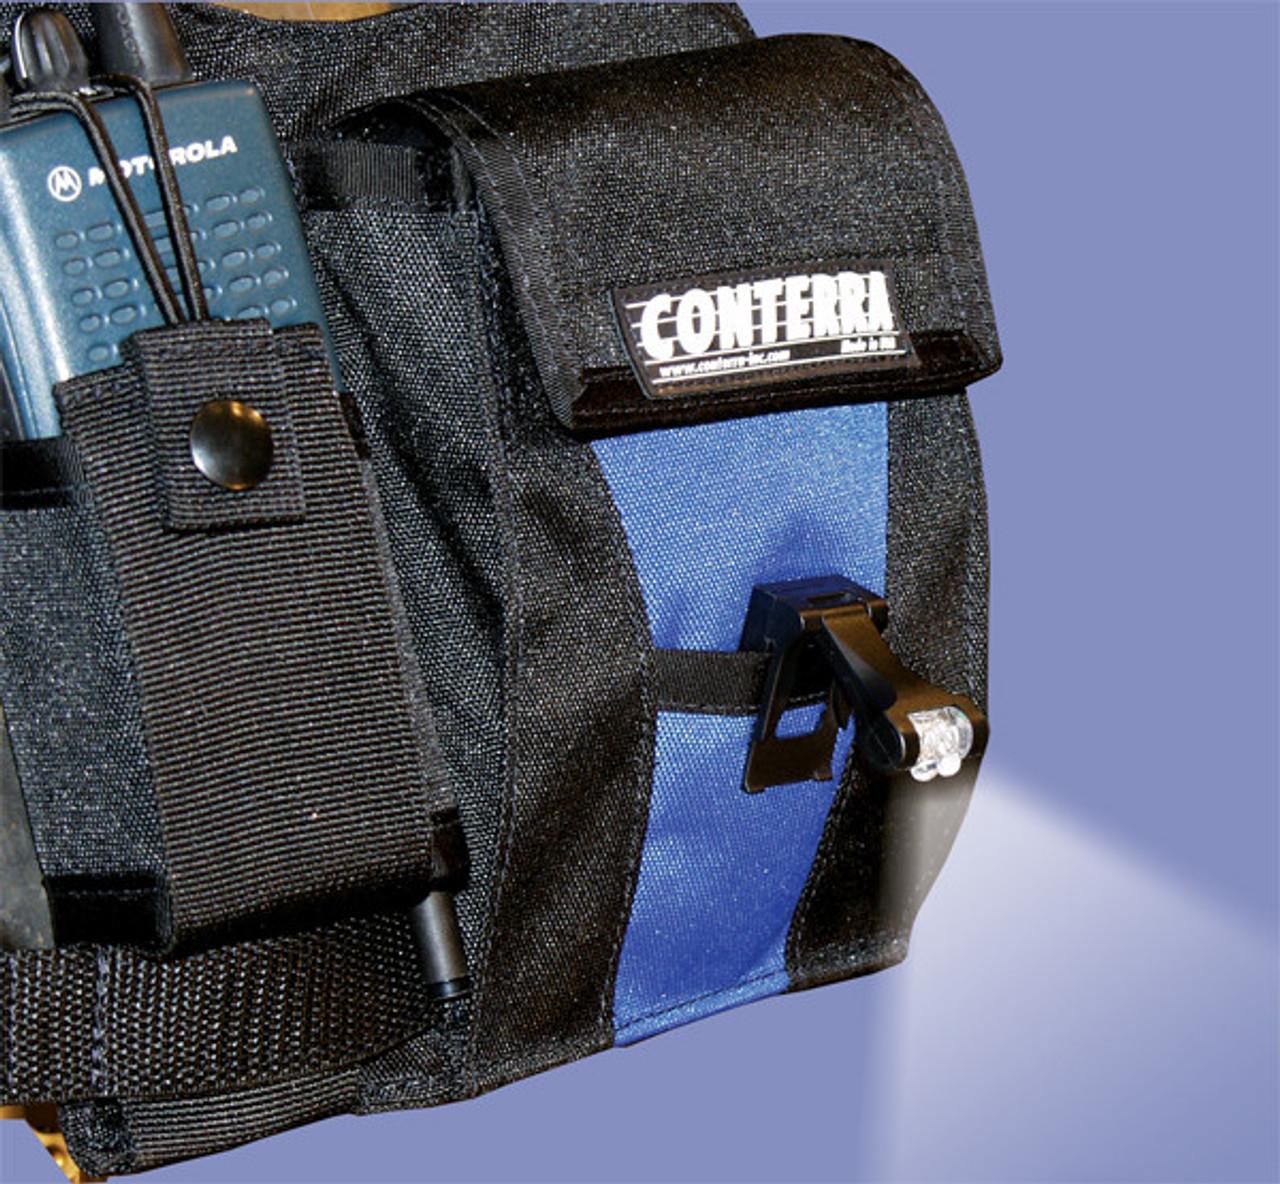 Conterra Adjusta-Pro Radio Chest Harness